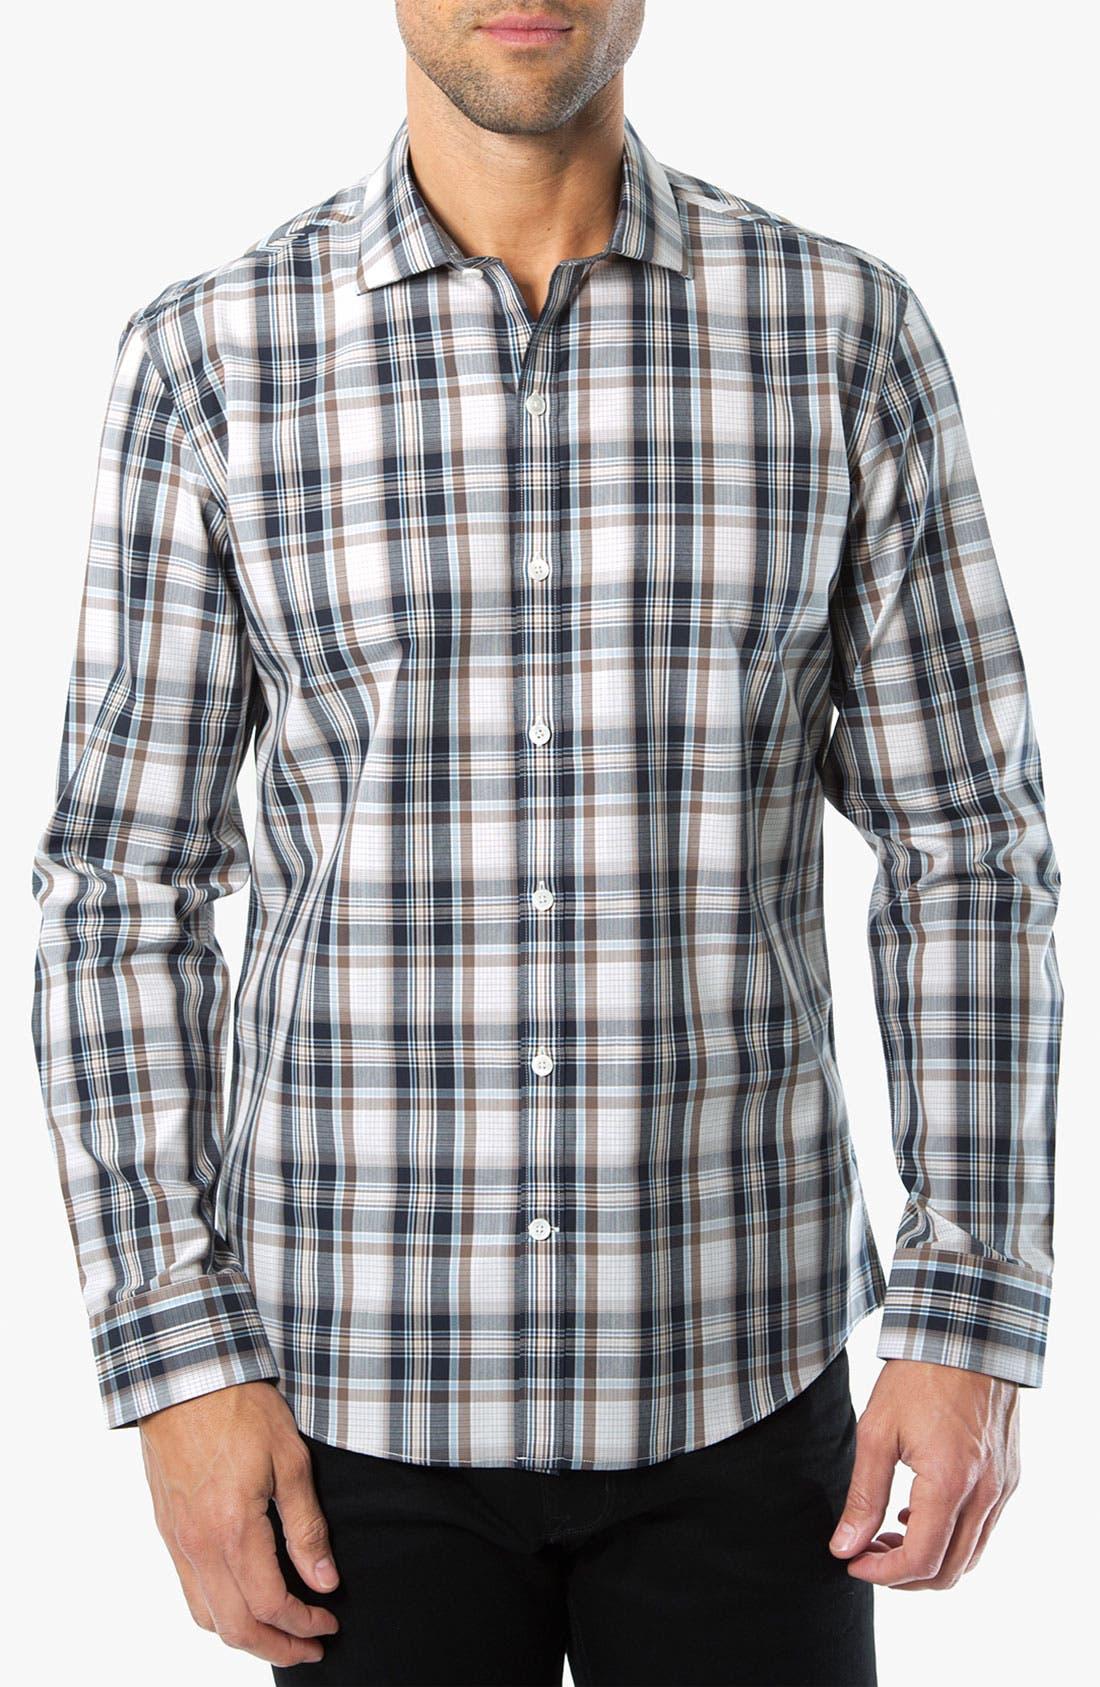 Main Image - Kenson 'High Noon' Plaid Woven Shirt